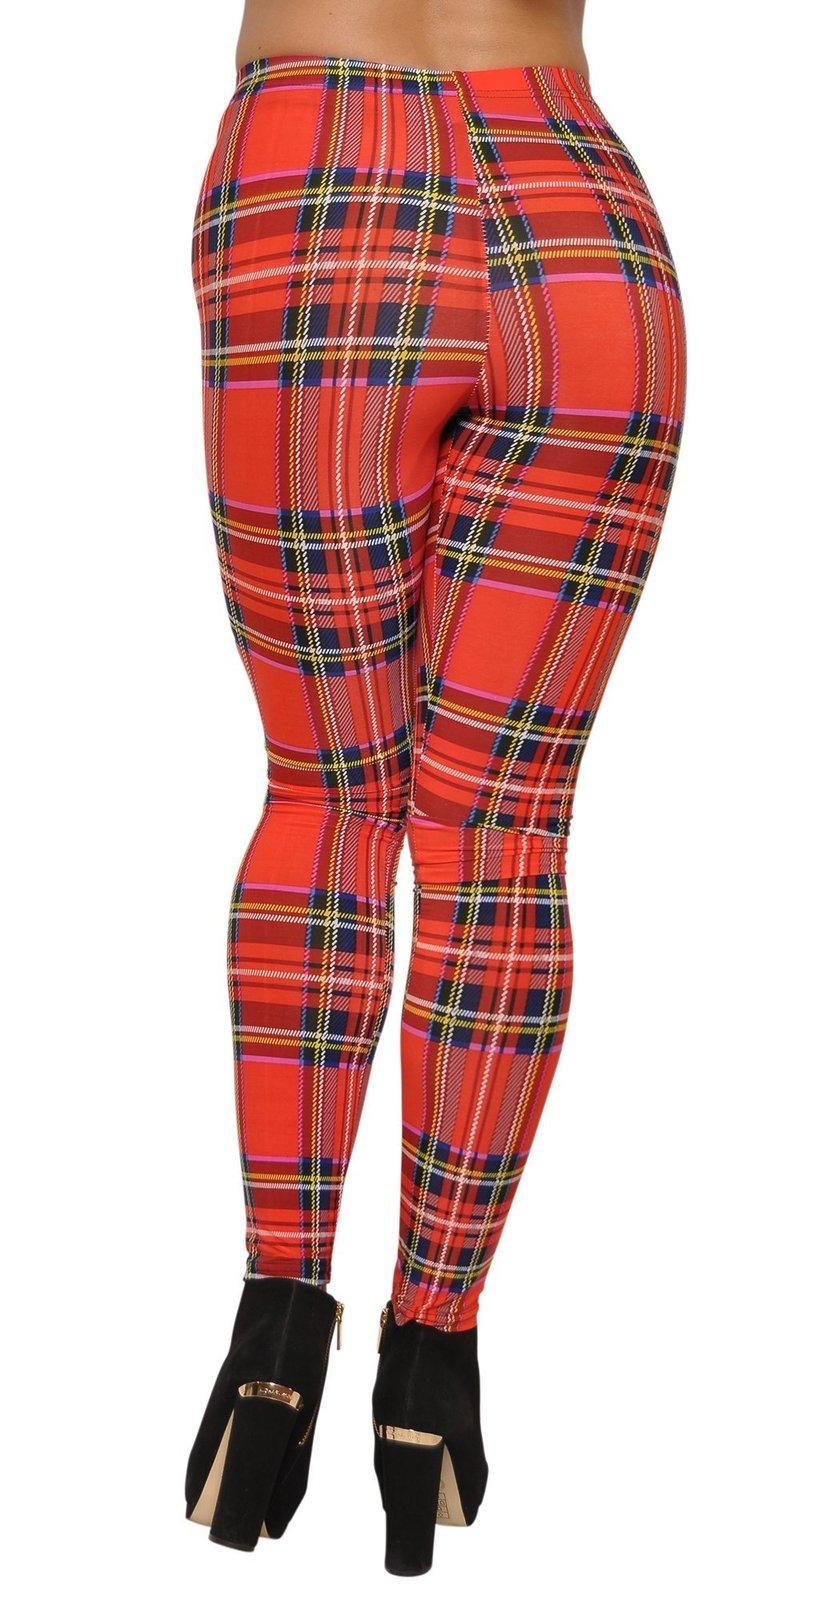 Tartan Red Plaid Leggings Size XL